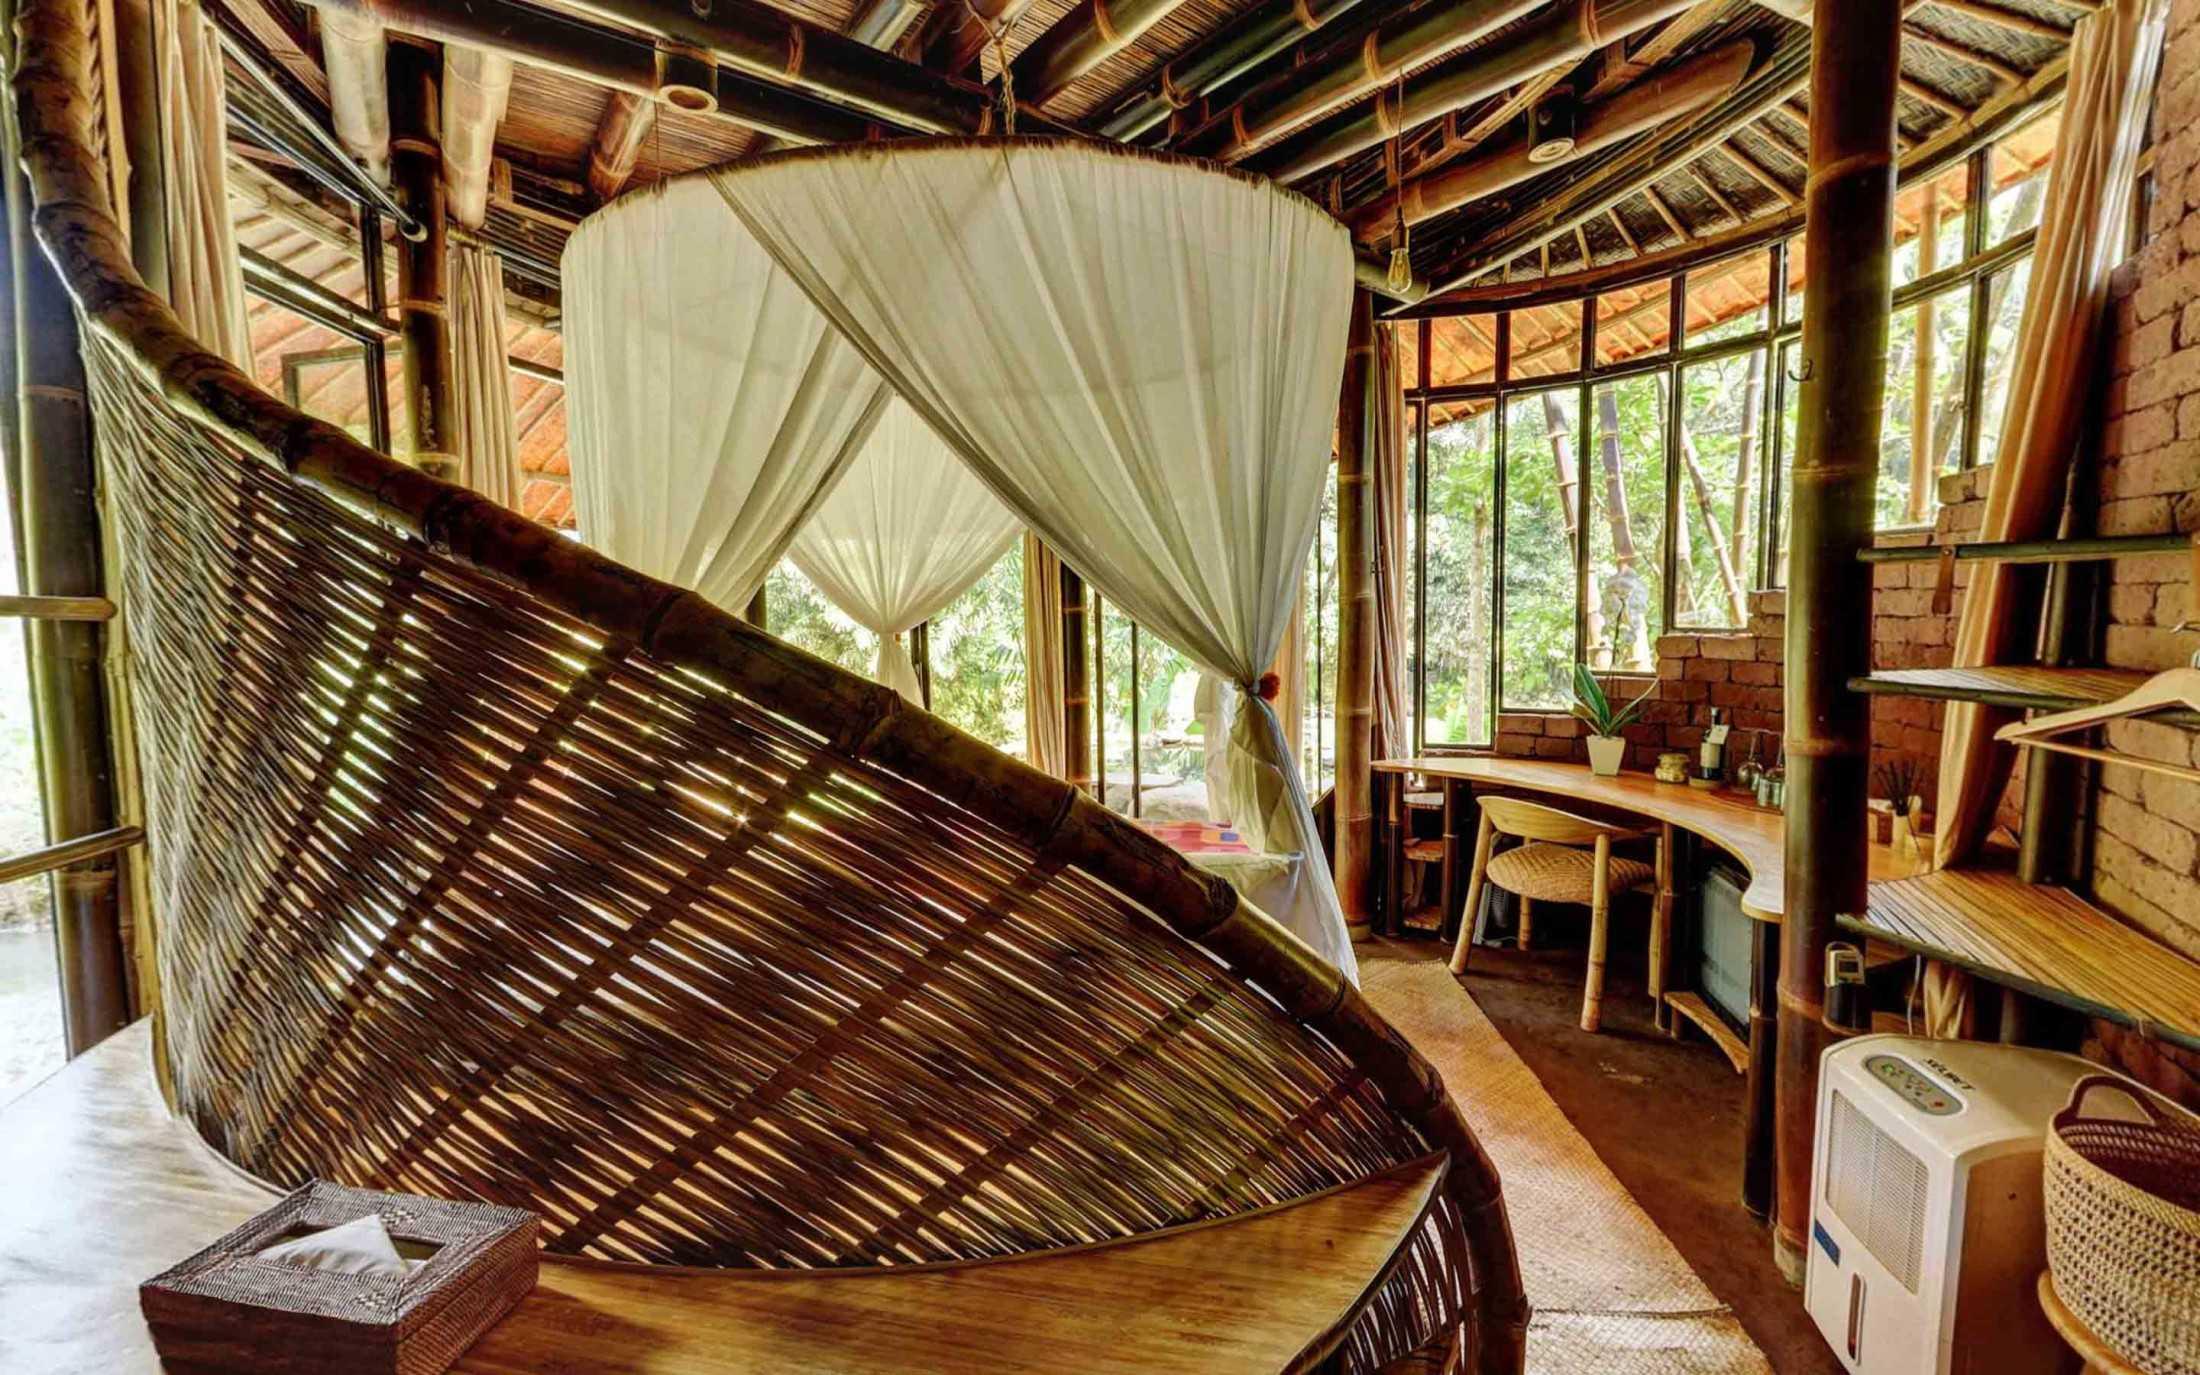 Agung Budi Raharsa | Architecture & Engineering Riverbend Bamboo House - Bali Bali, Indonesia Bali, Indonesia Courtyard Tropical 88706